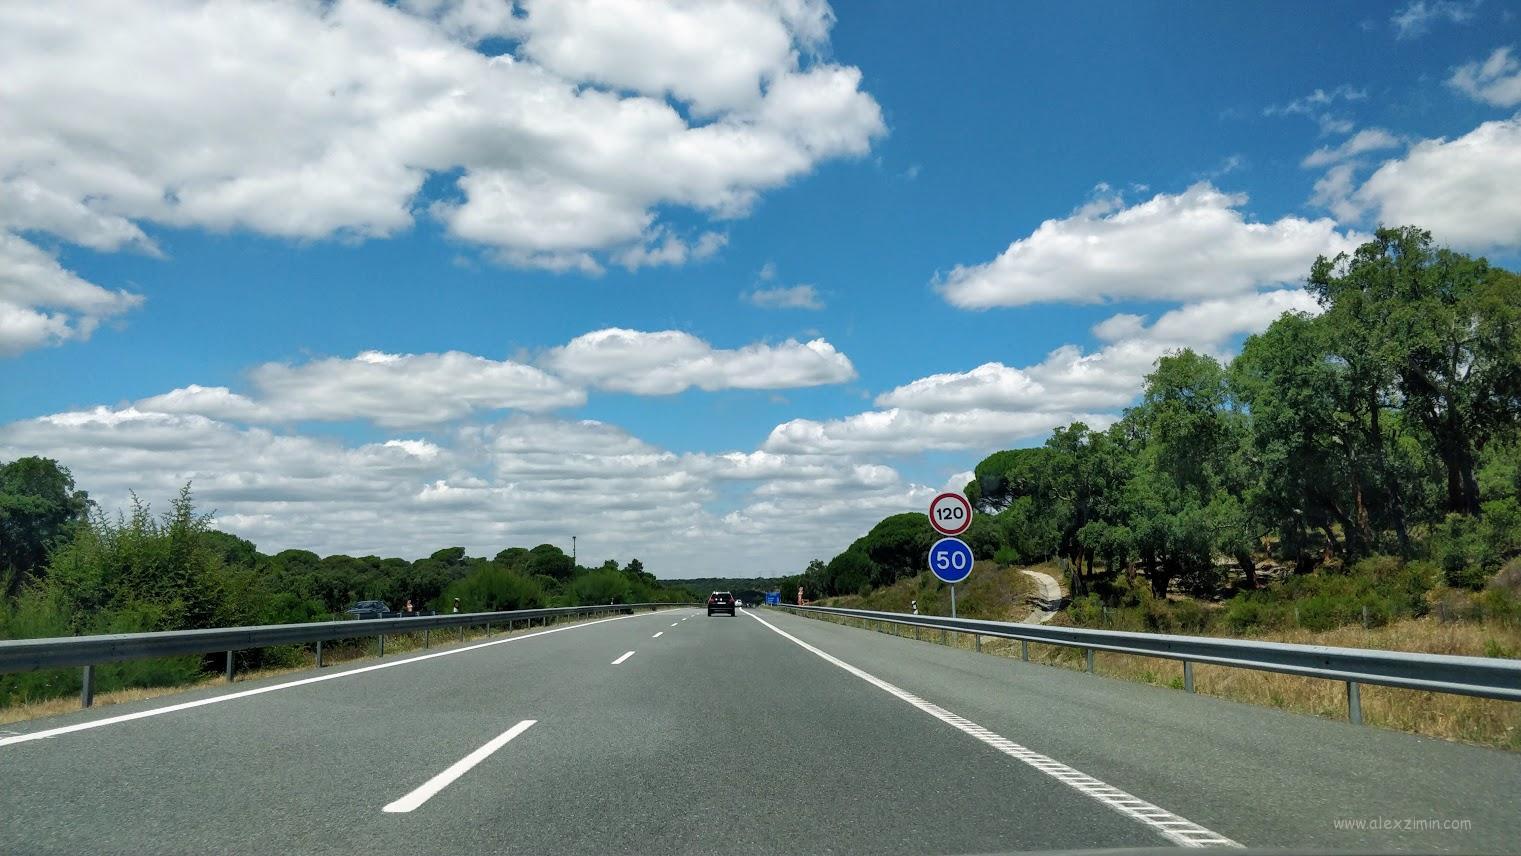 Ограничение скорости на автобане в Португалии - 120 км/ч